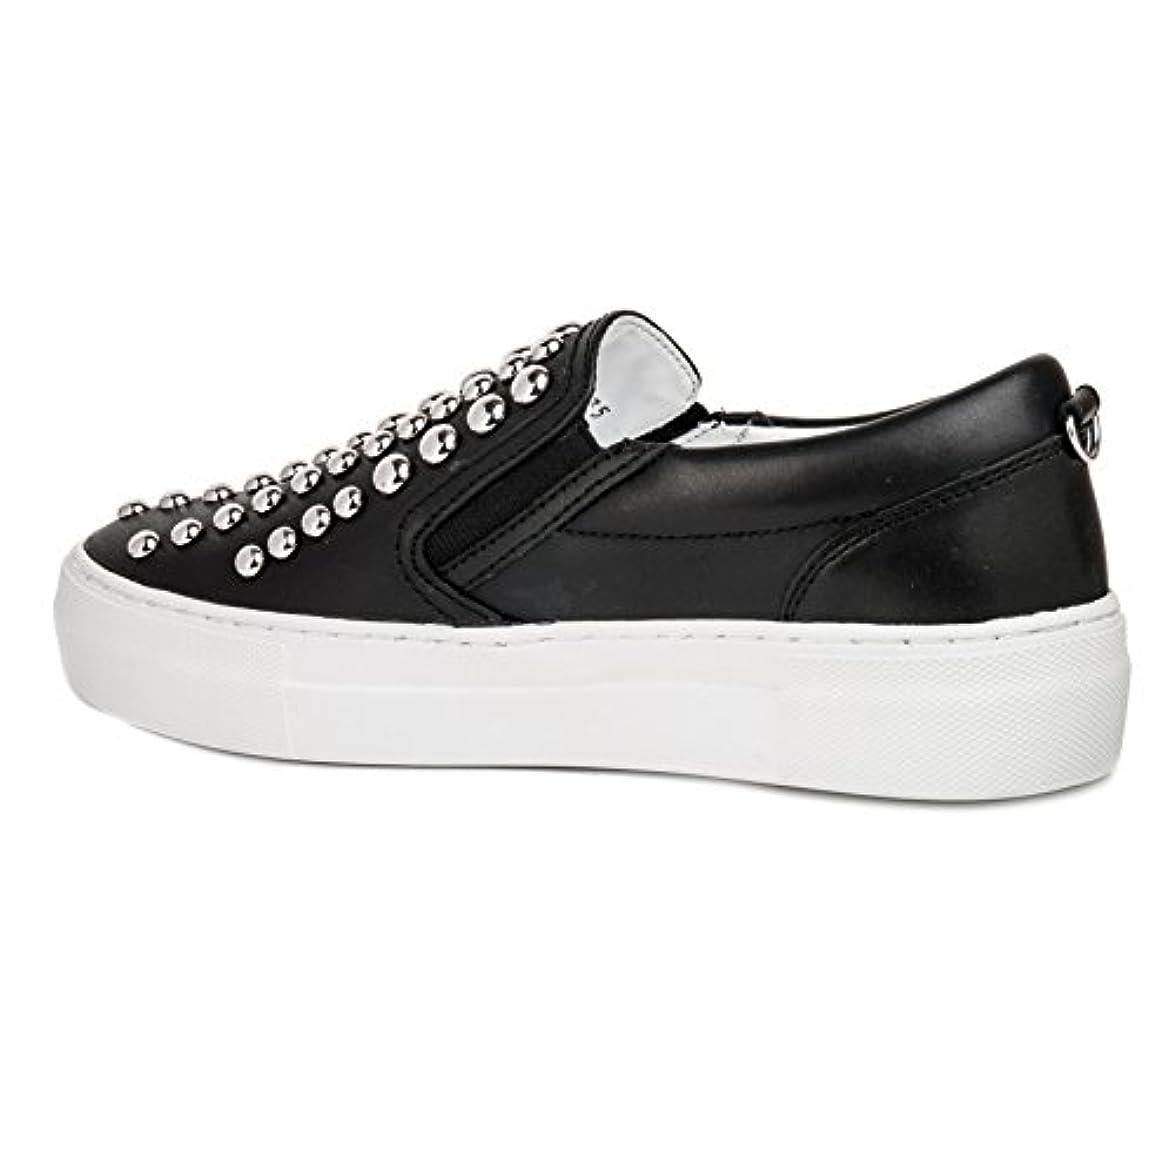 Cult Scarpe Slip On Donna Cle102932 Leather Black Pe17